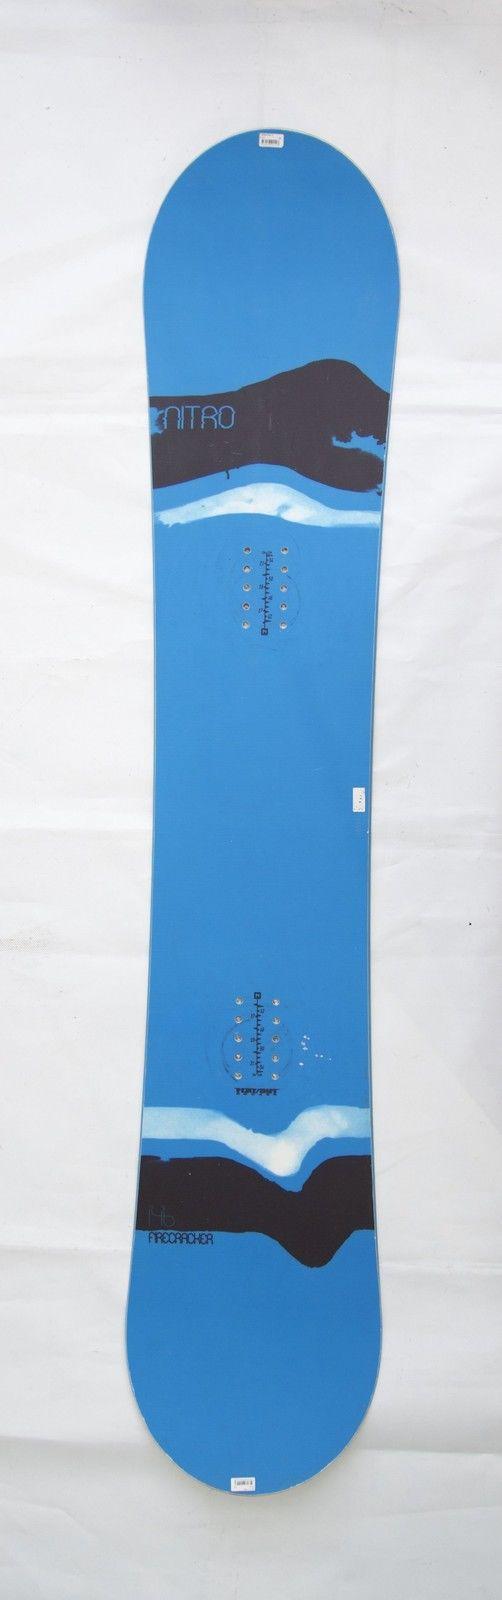 Firekracker 146 cm Snowboard Damen Nitro 2016 gebraucht